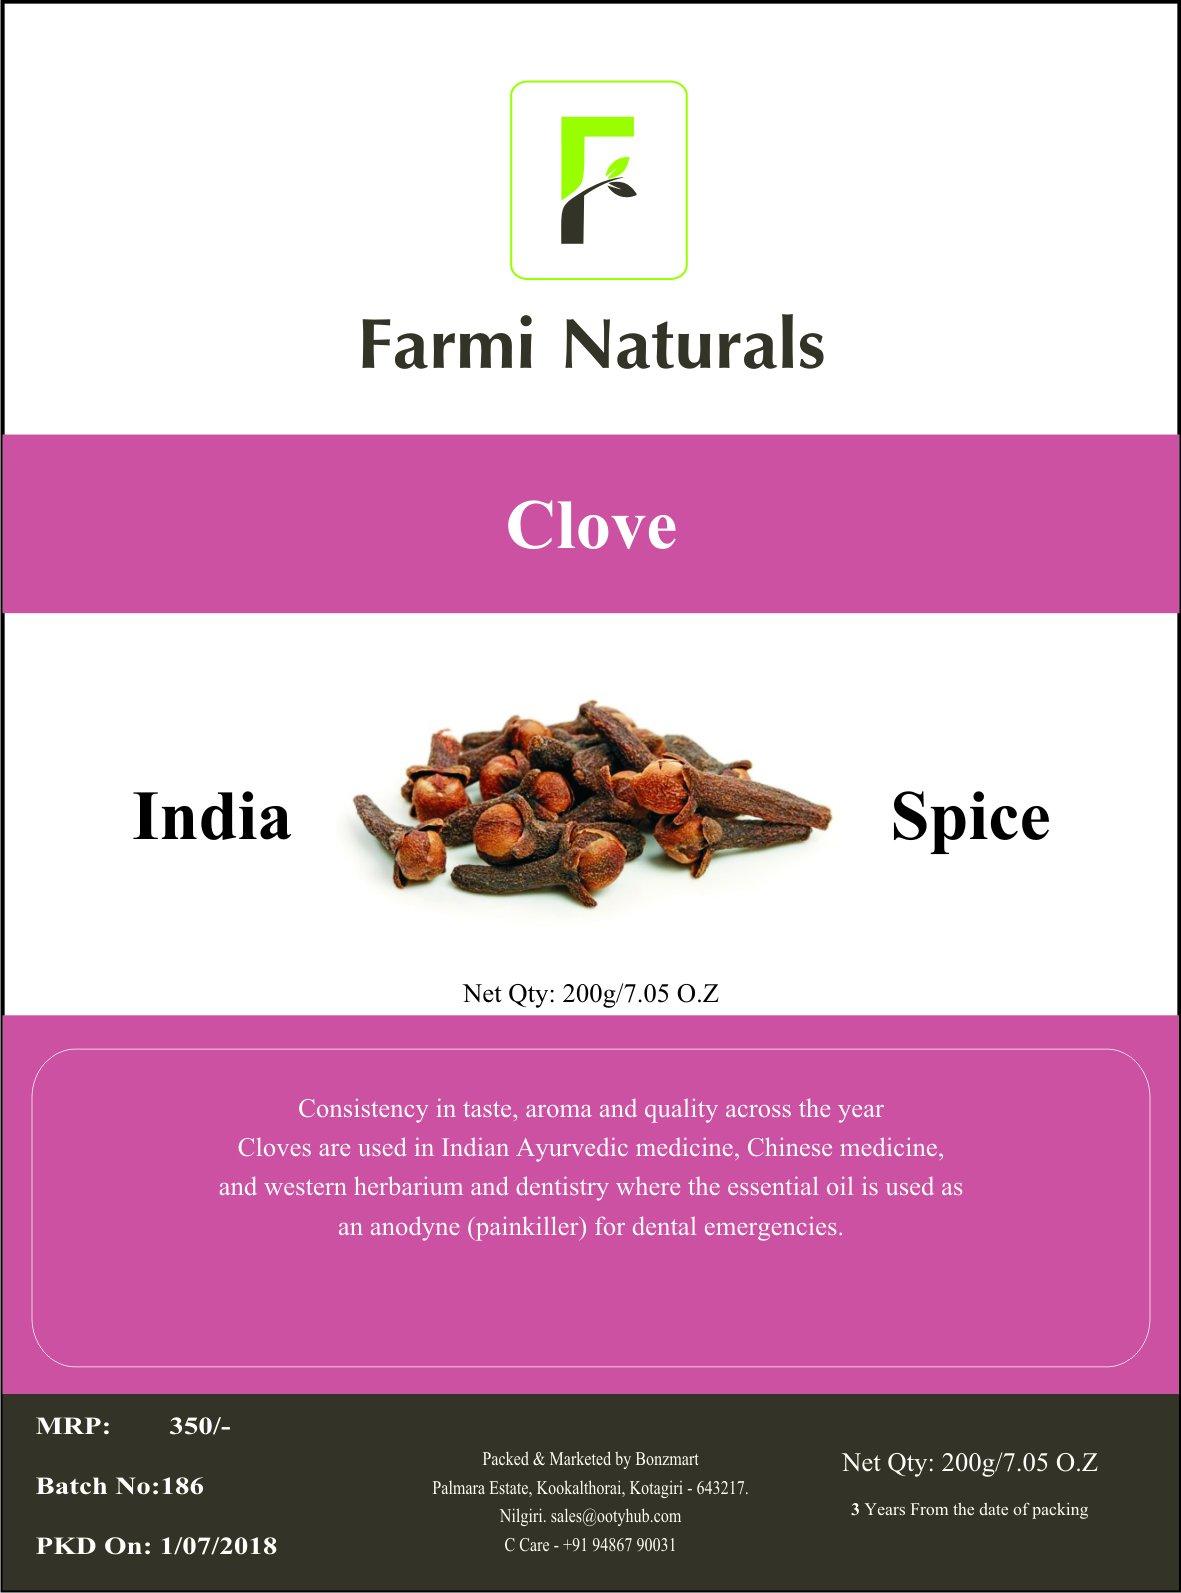 Whole Clove Indian Spice - 200g/7.05 oz